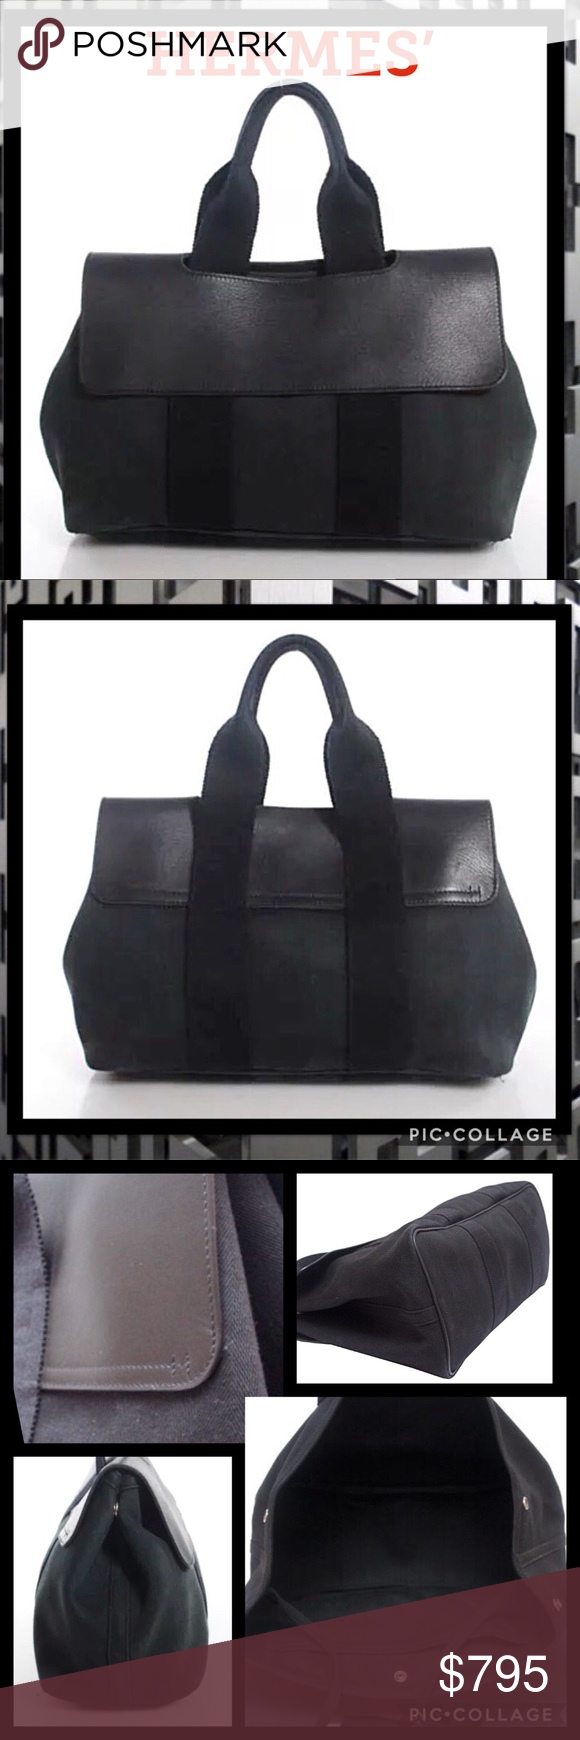 c79b7cee830 Authentic HERMES  Valparaiso PM Herringbone Bag This is an amazing  AUTHENTIC Hermes Valparaiso PM Handbag